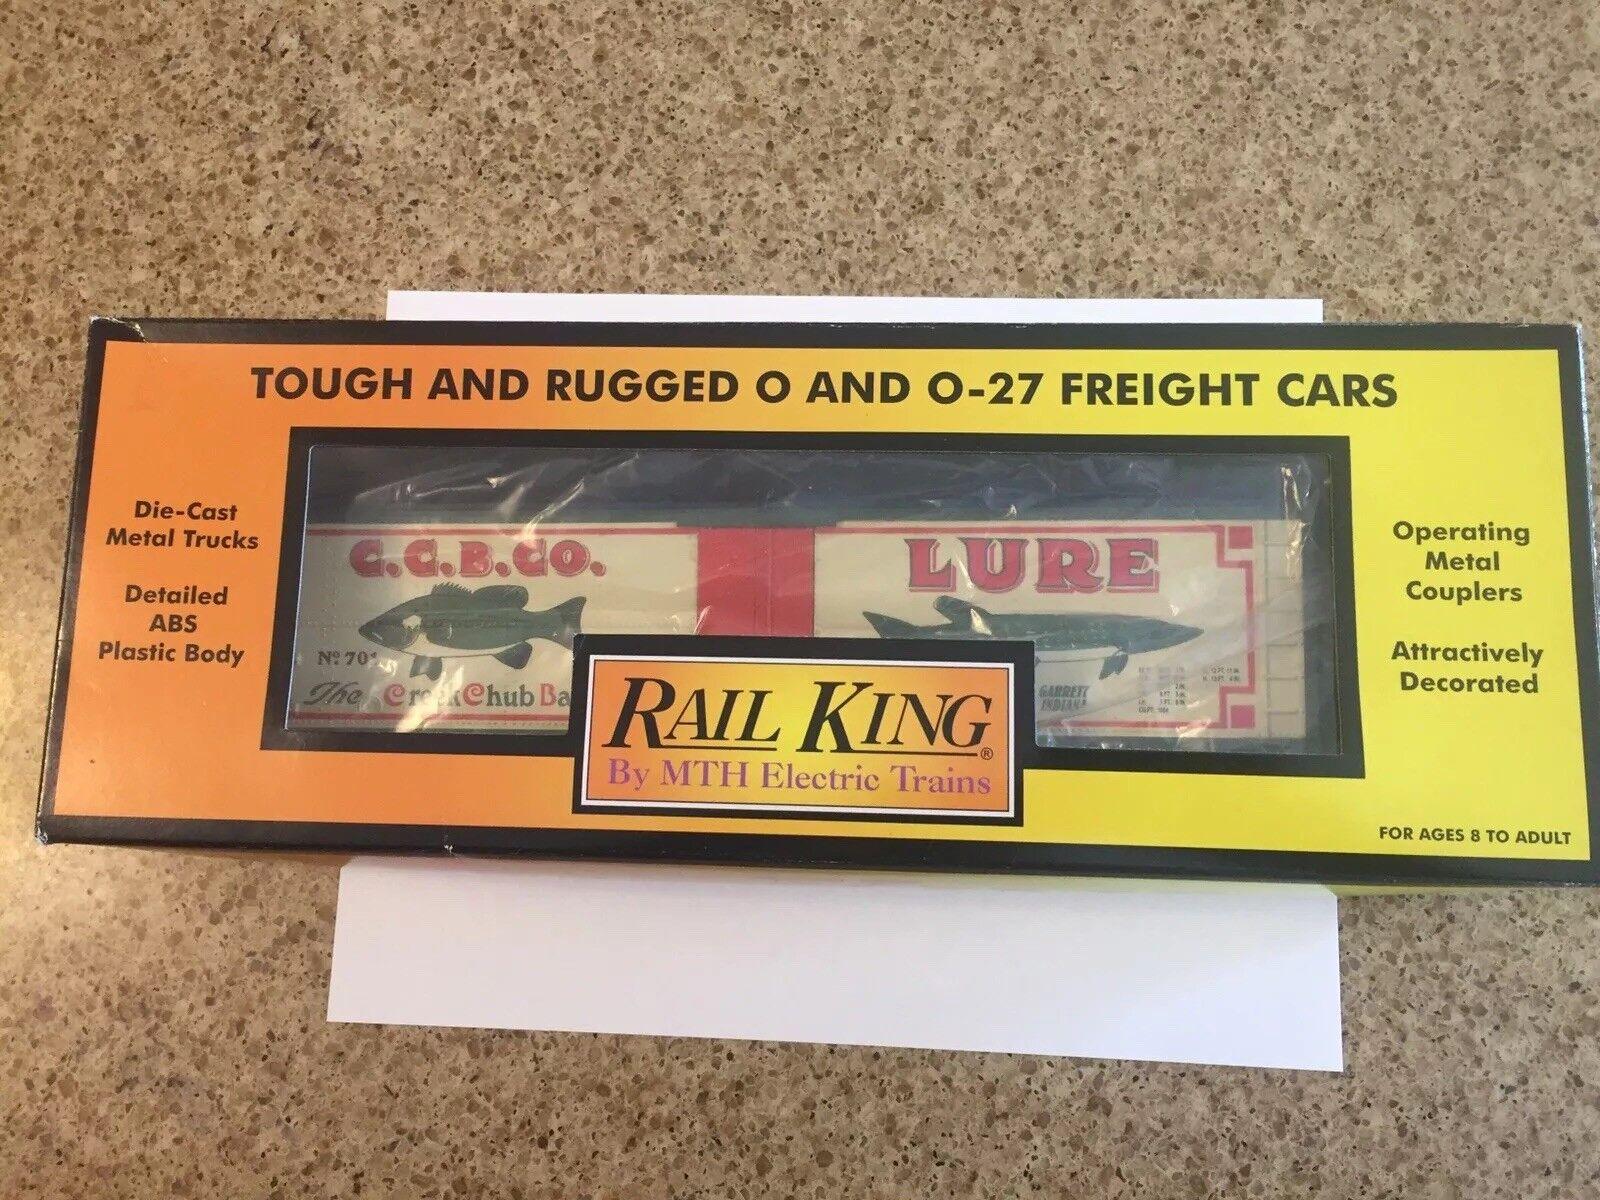 MTH CREEK CHUB BAIT COMPANY BOX CAR WITH ORIGINAL BOX